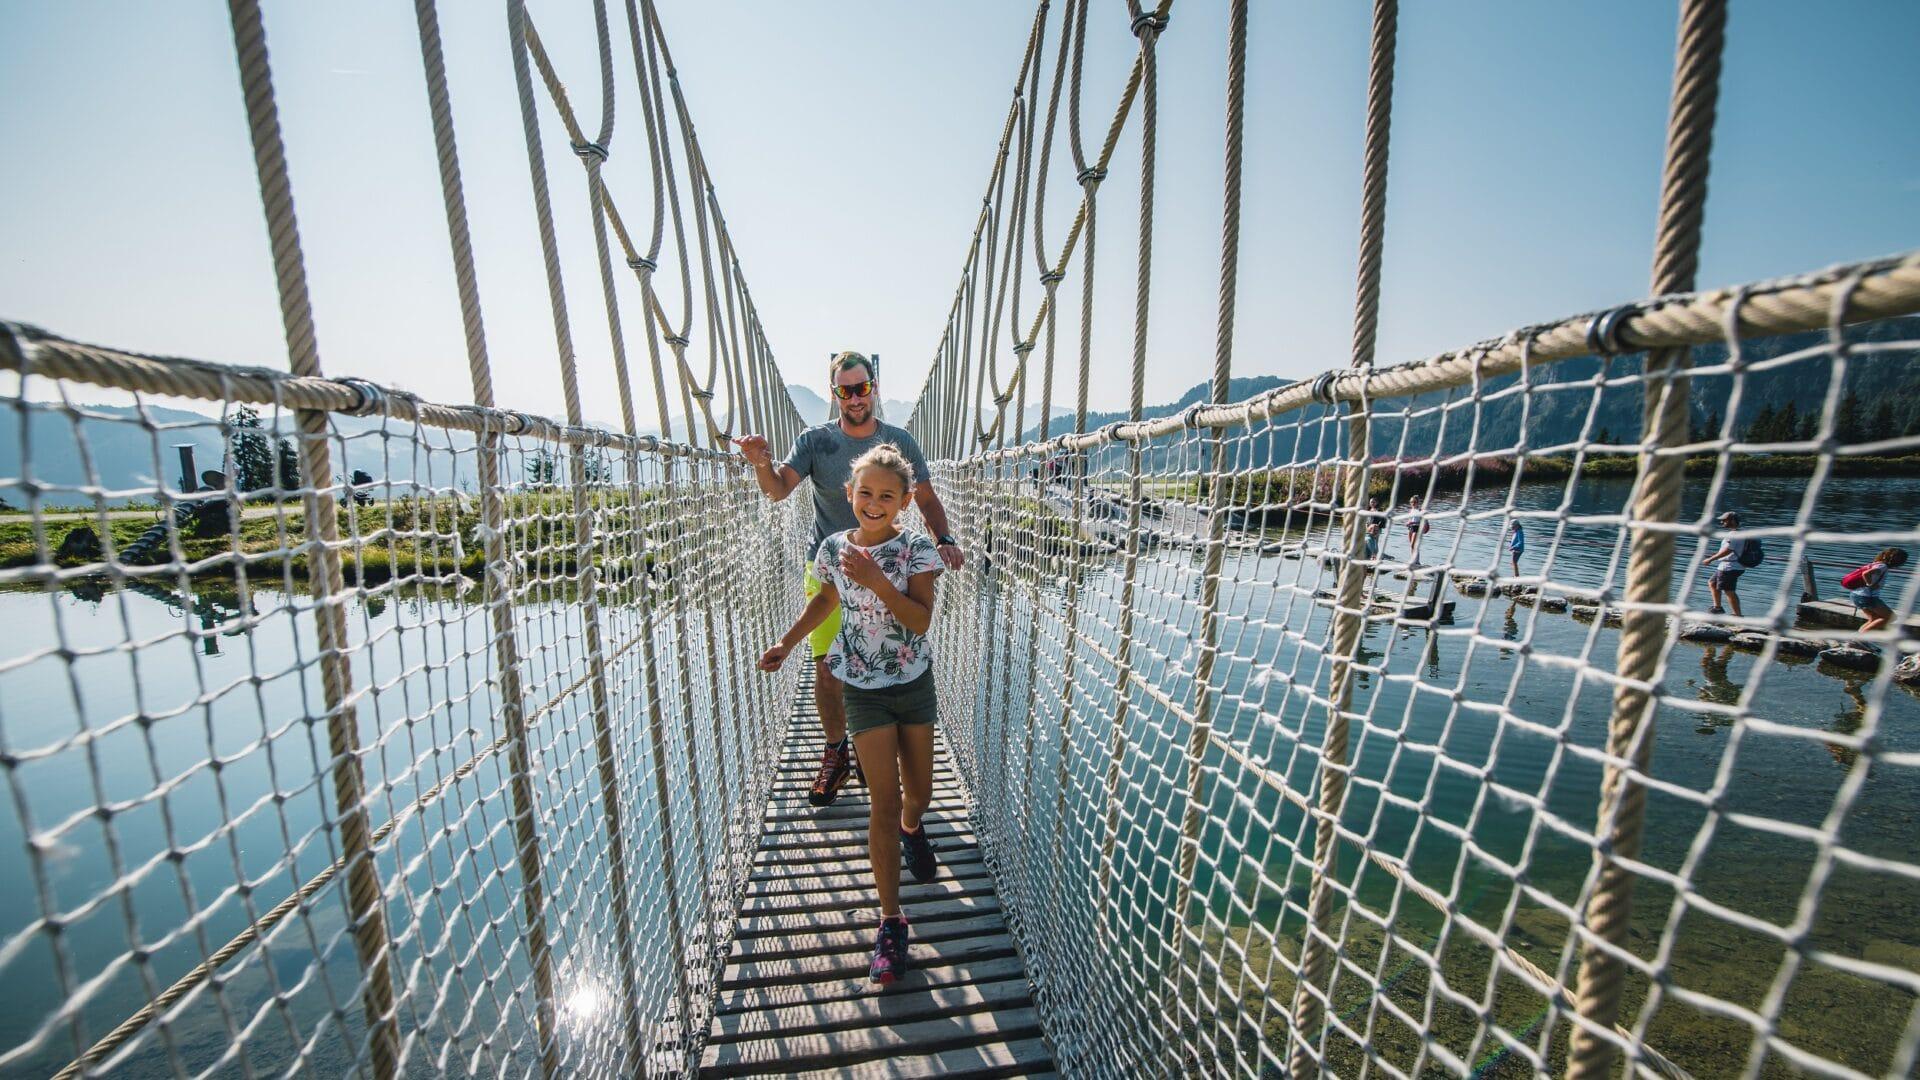 hofgut-apartment-lifestyle-resort-wagrain-freiheit-spueren-als-familie-berg-grafenberg-bruecke